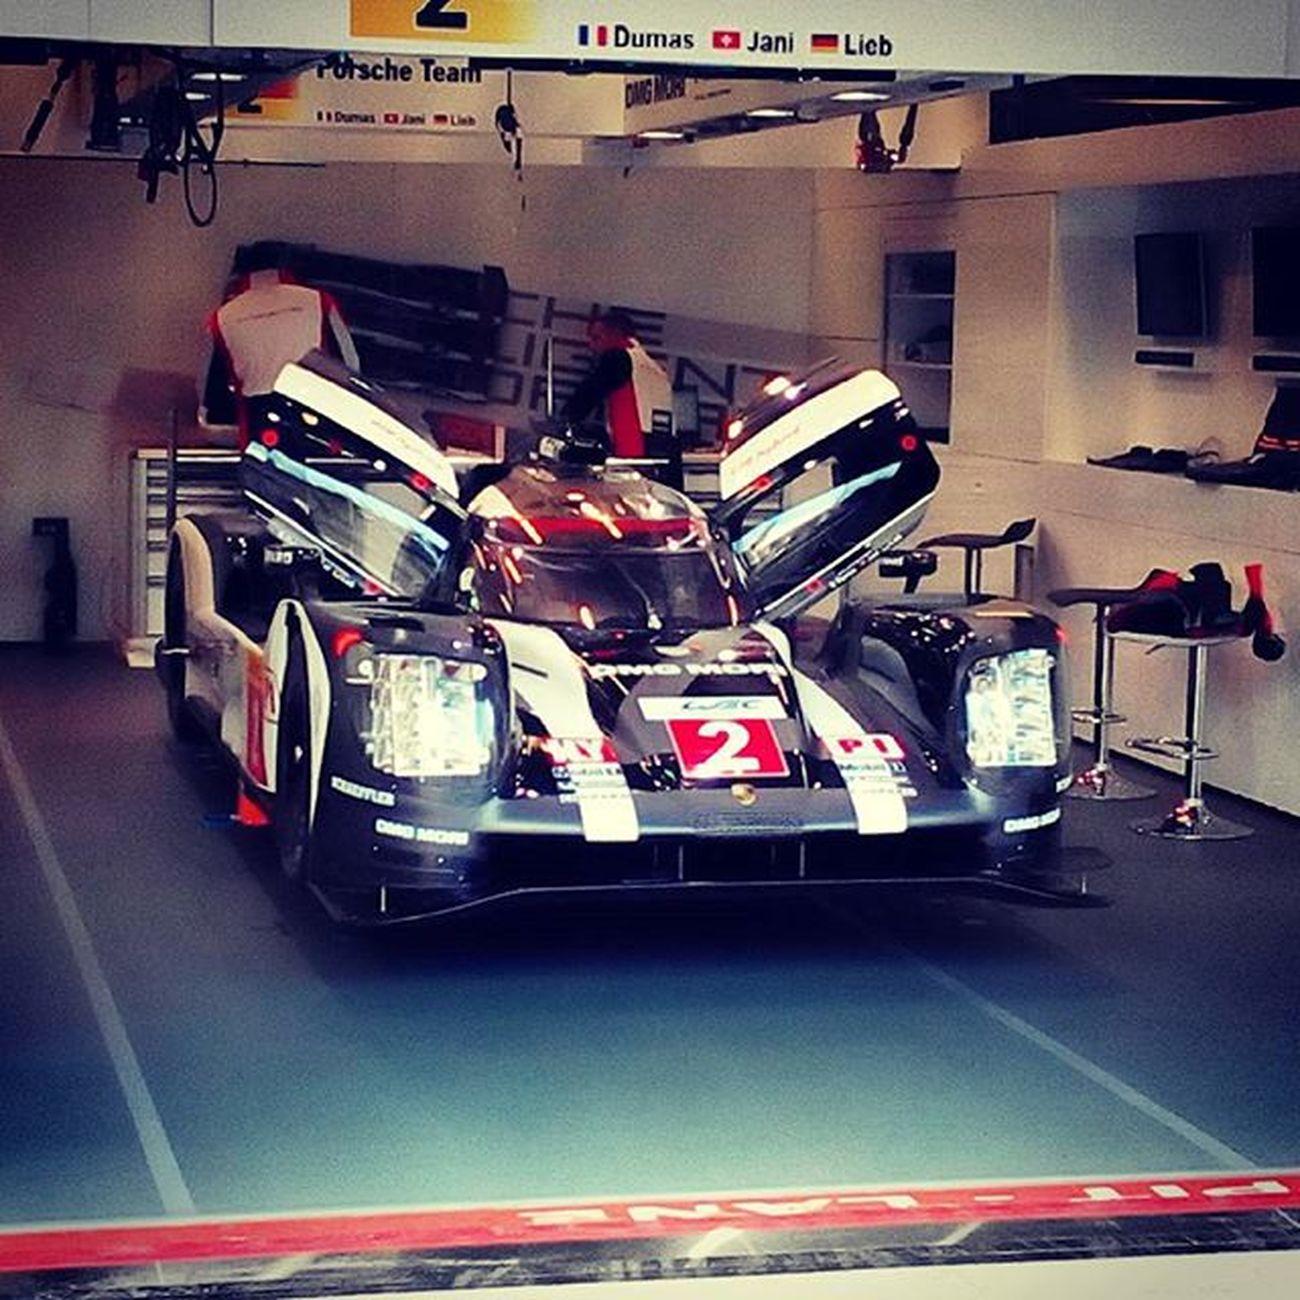 Spa Francorchamps Porsche Hybrid 919 FIAWEC 6hours Pitlane